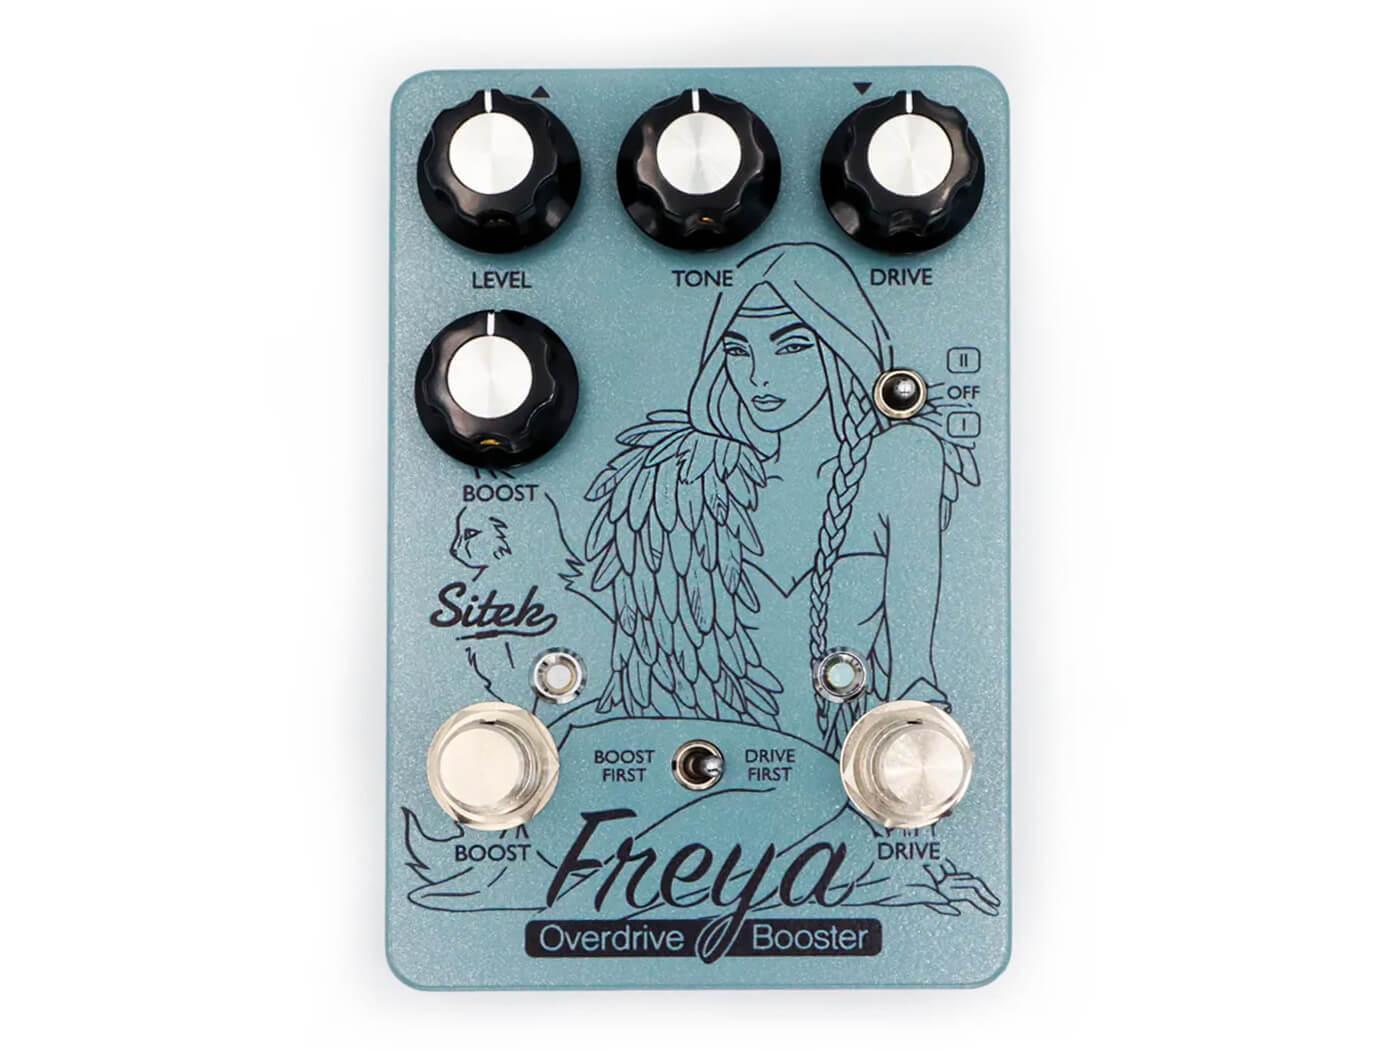 Sitek Freya